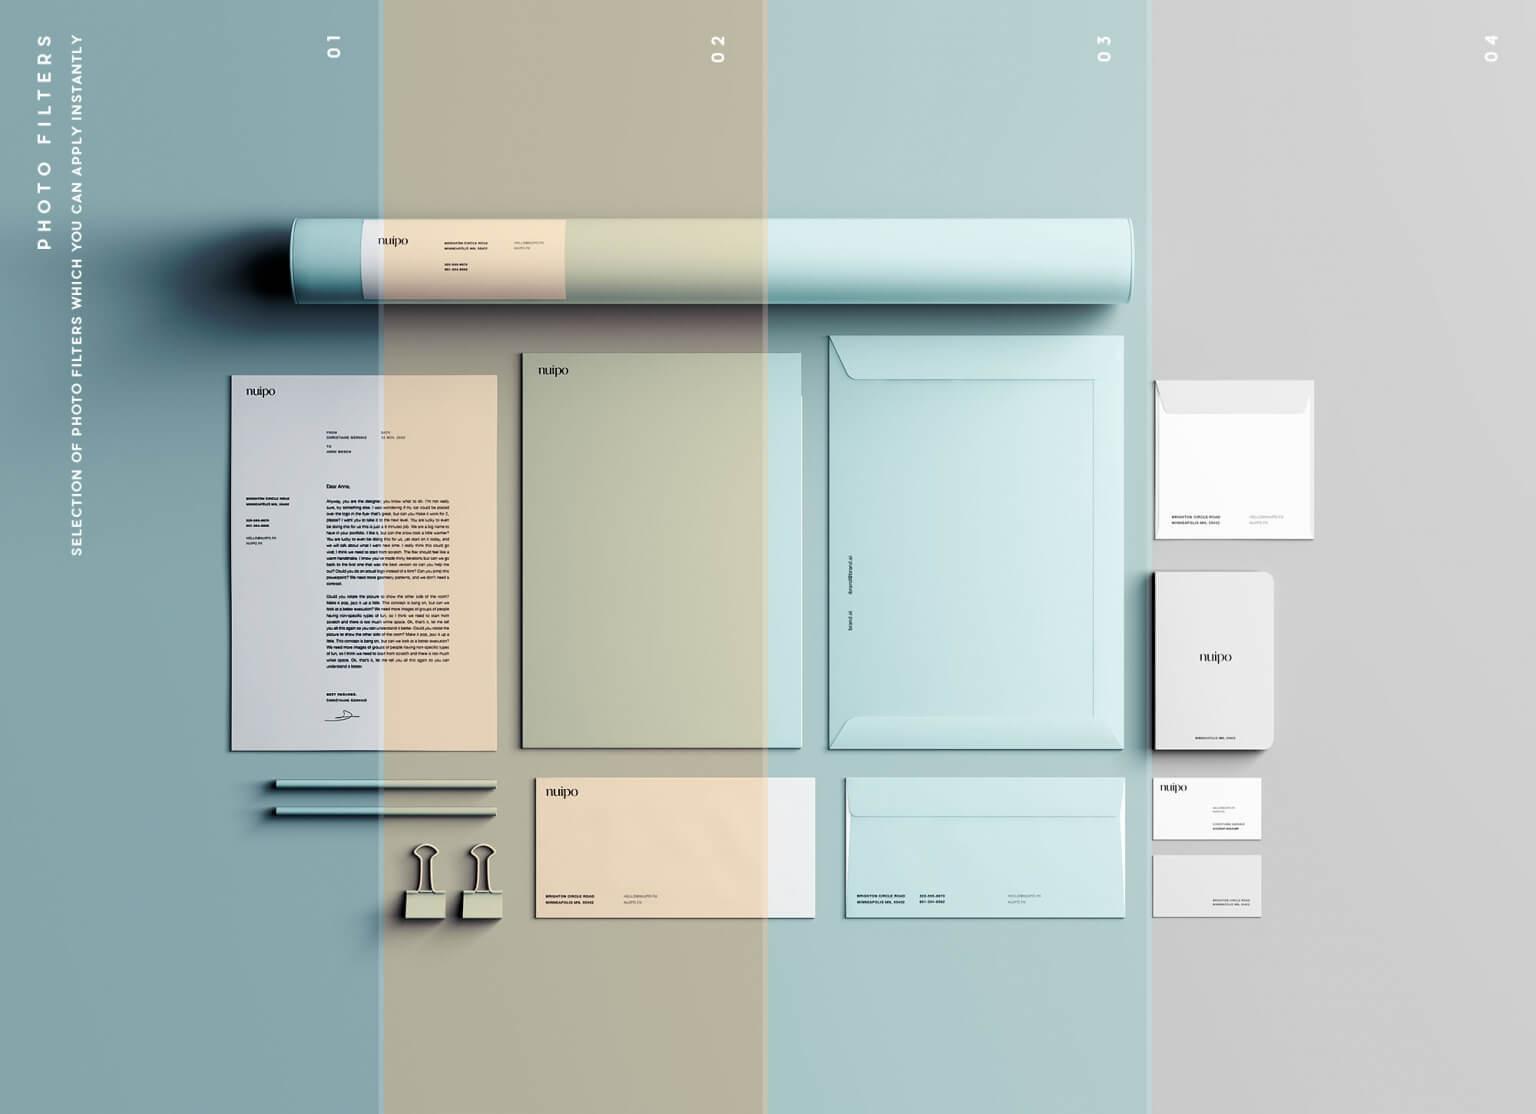 Free Classic Branding Presentation Mockup PSD Template